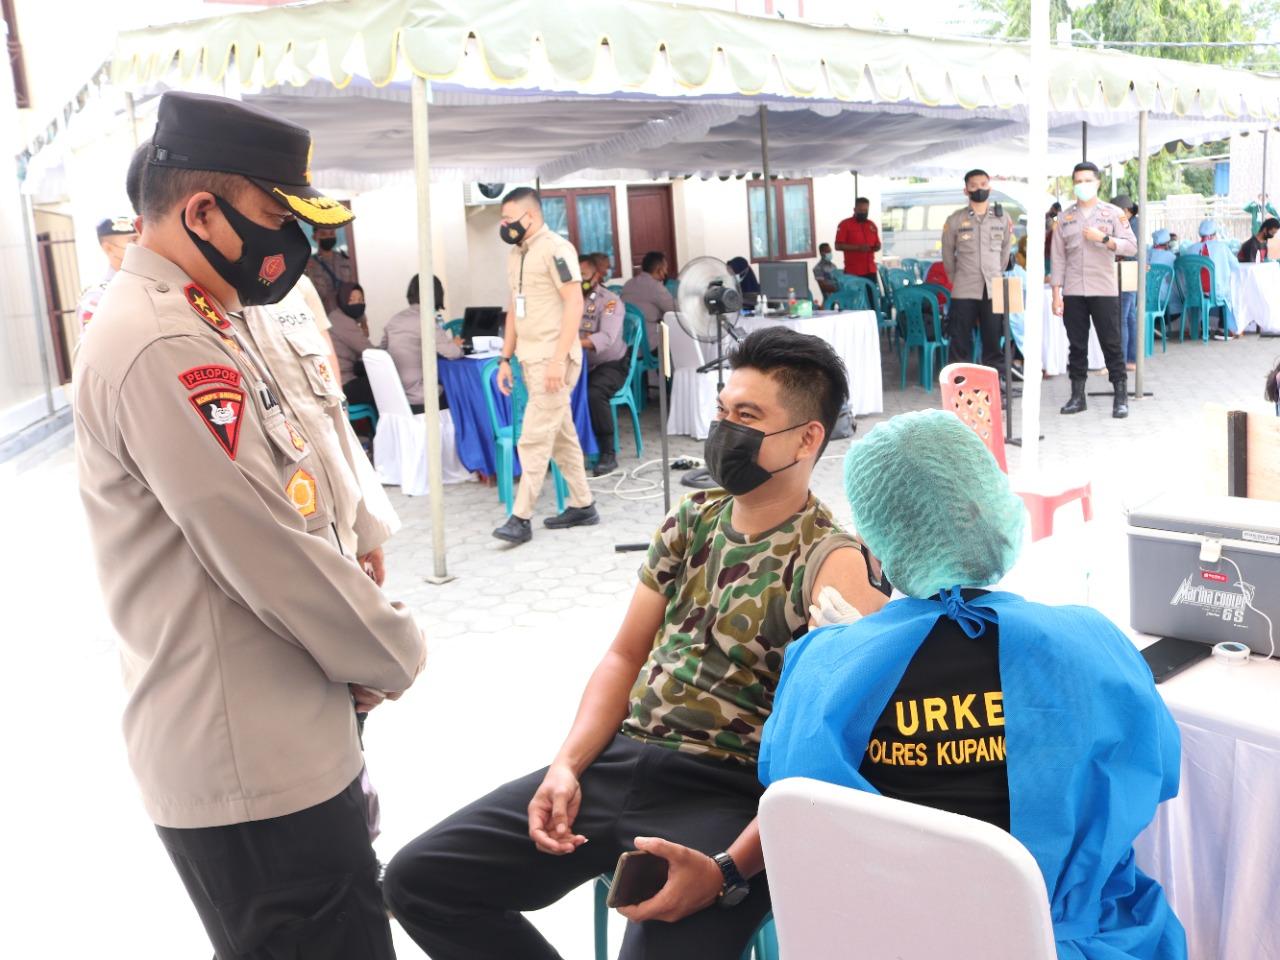 Kapolda NTT Irjen Pol Drs Lotharia Latif SH MHum mengapresiasi pelaksanaan vaksinasi serentak di 3 Polres selama dua hari, Senin (6/9/2021) dan Selasa